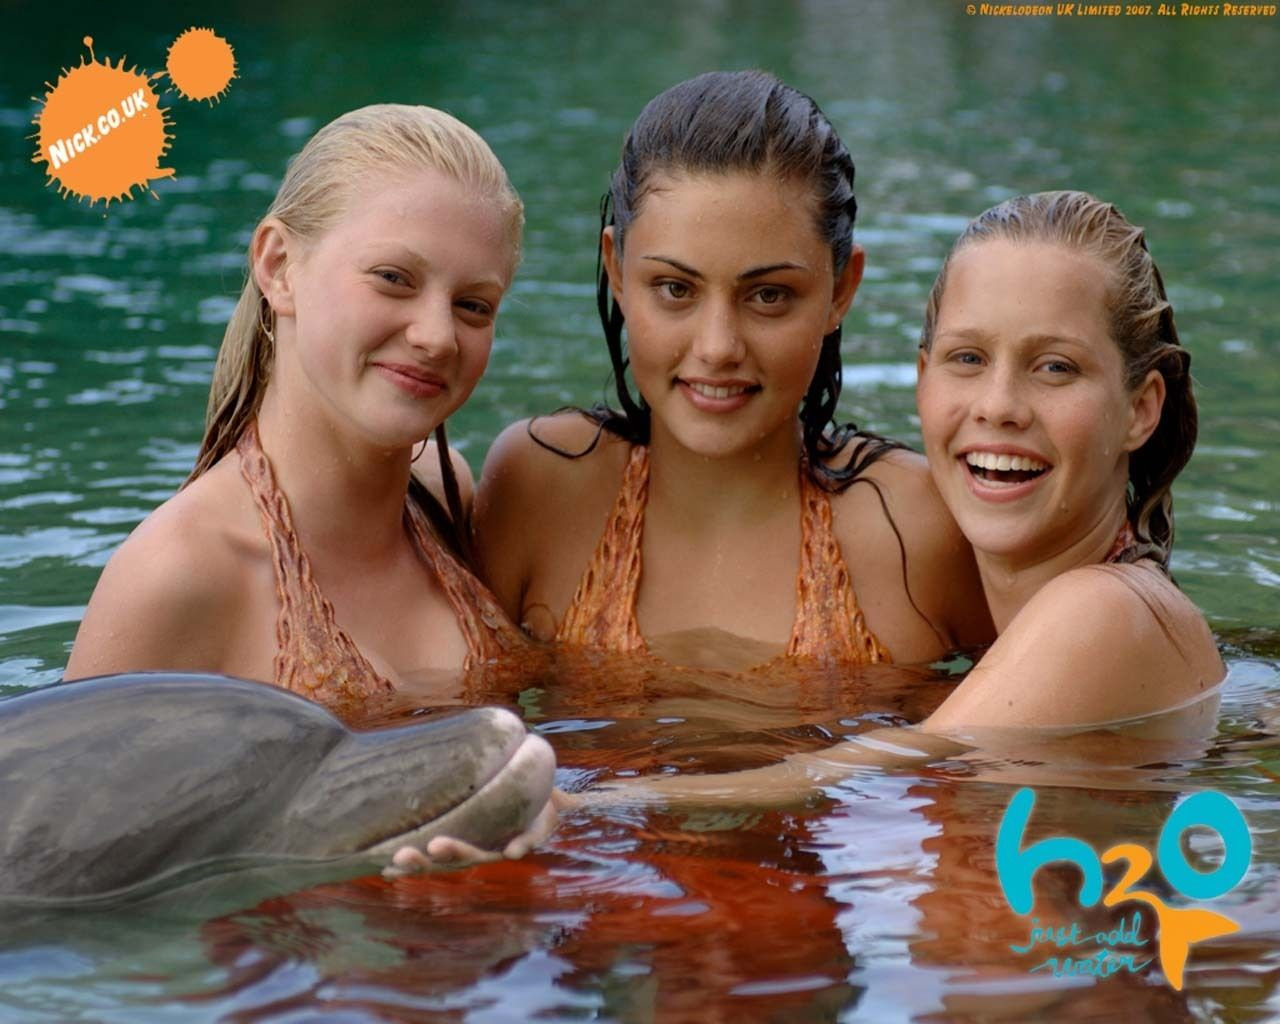 Ausmalbilder H2o Plötzlich Meerjungfrau Emma : Omg Phoebe Tonkin Claire Holt From The Vampire Diaries The